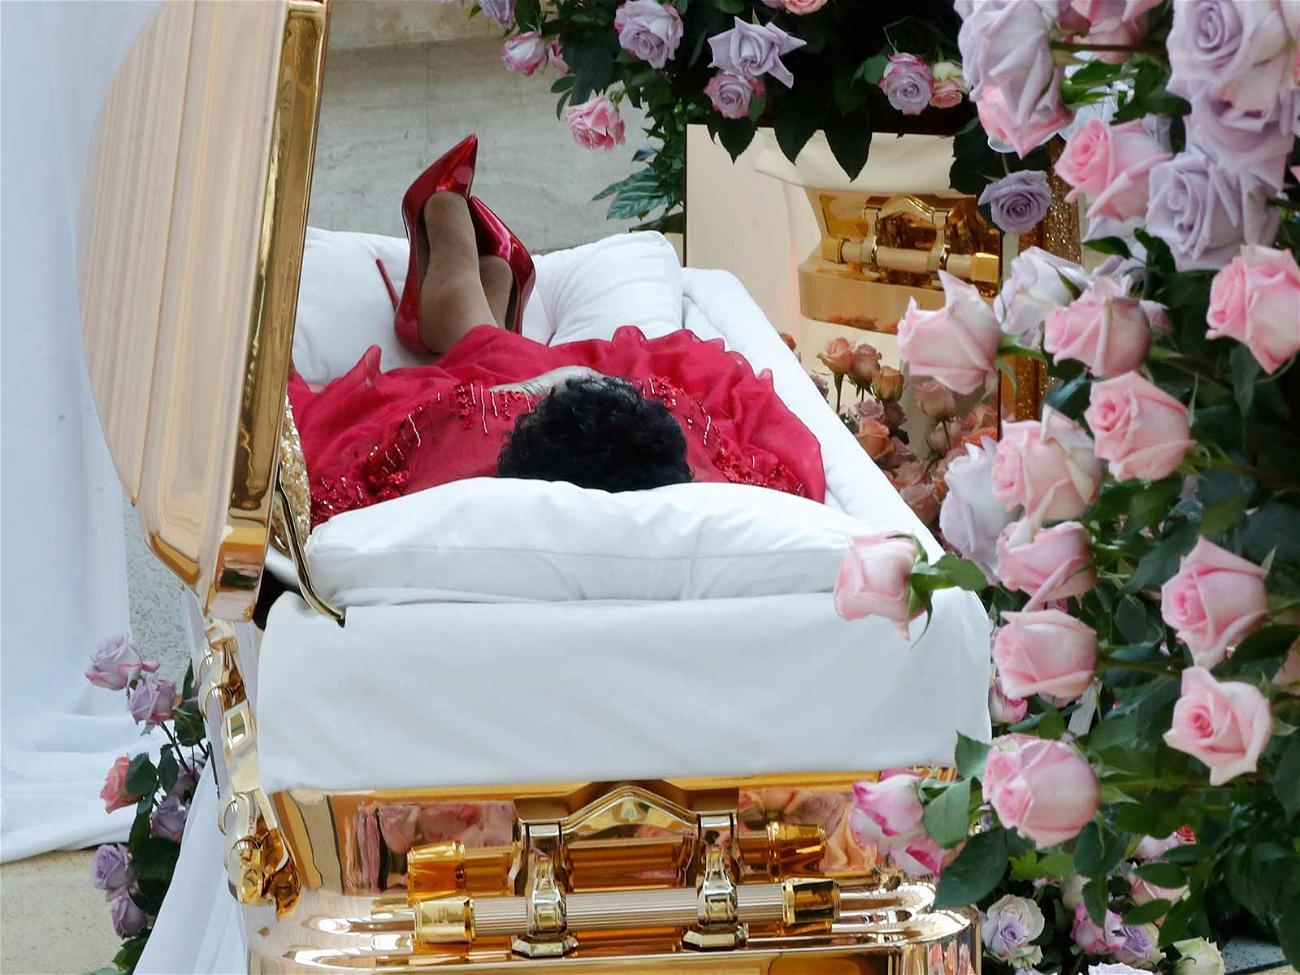 Aretha Franklin casket